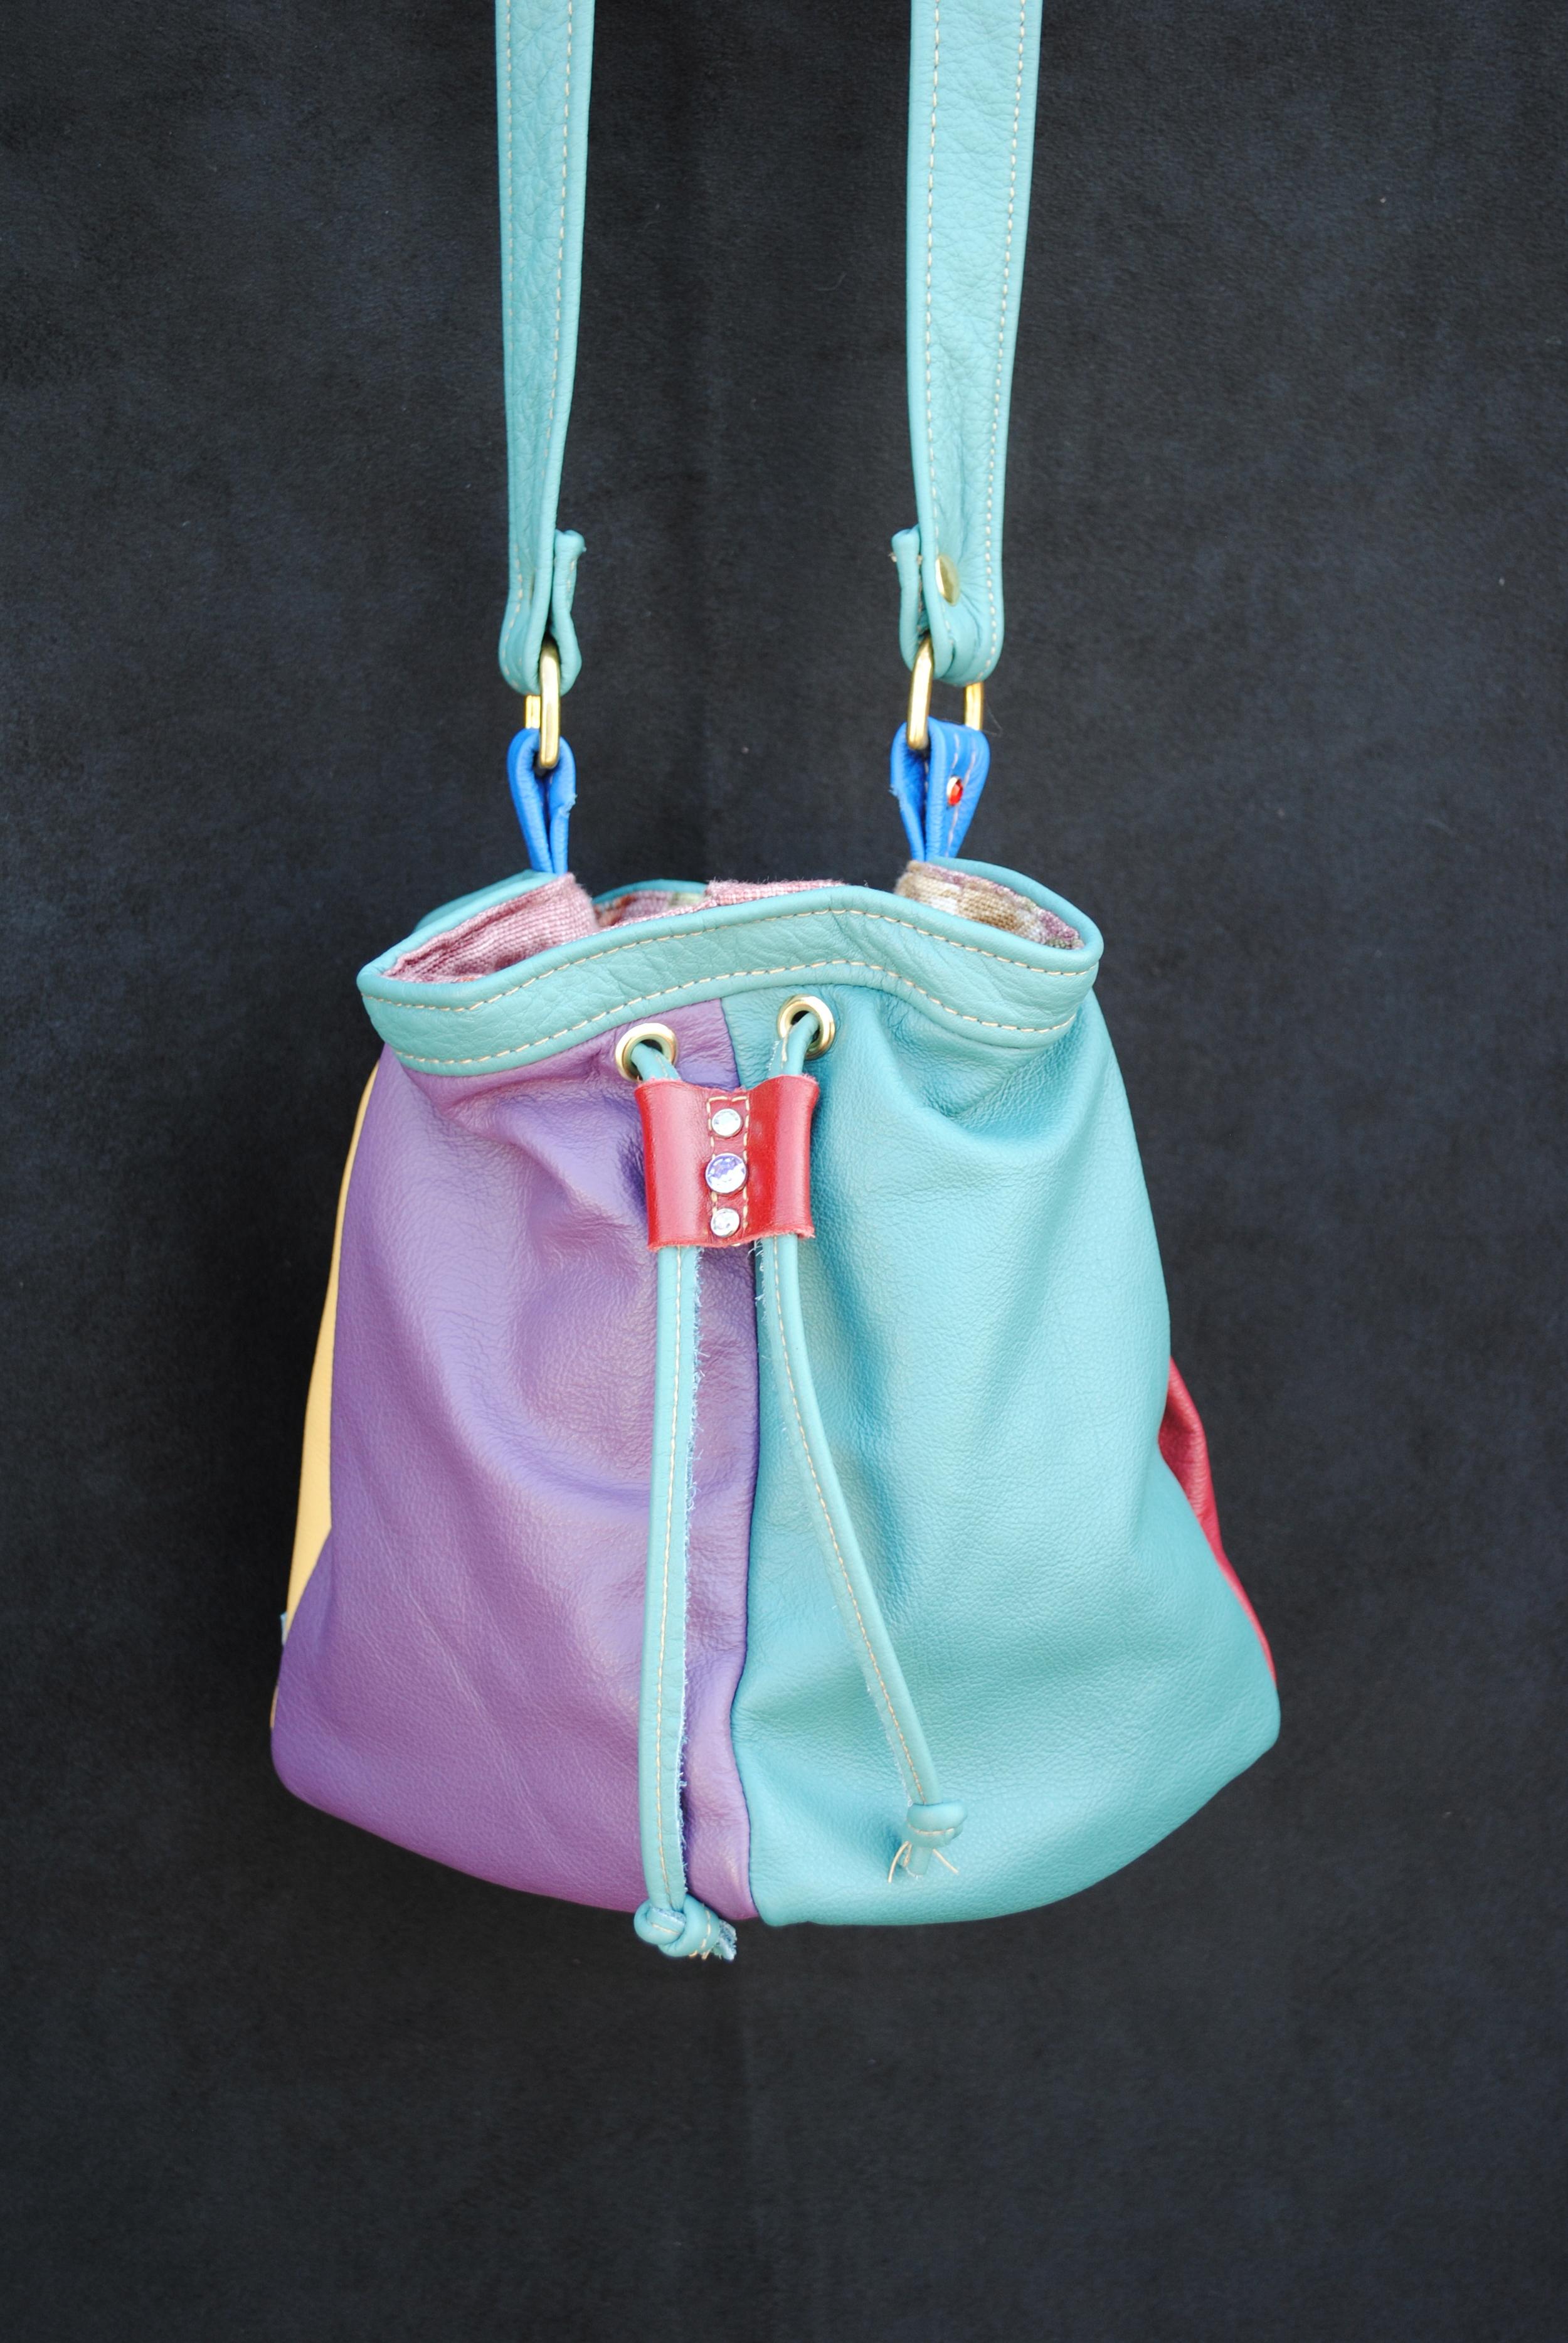 Discombobulated Rainbow Drawstring Bag